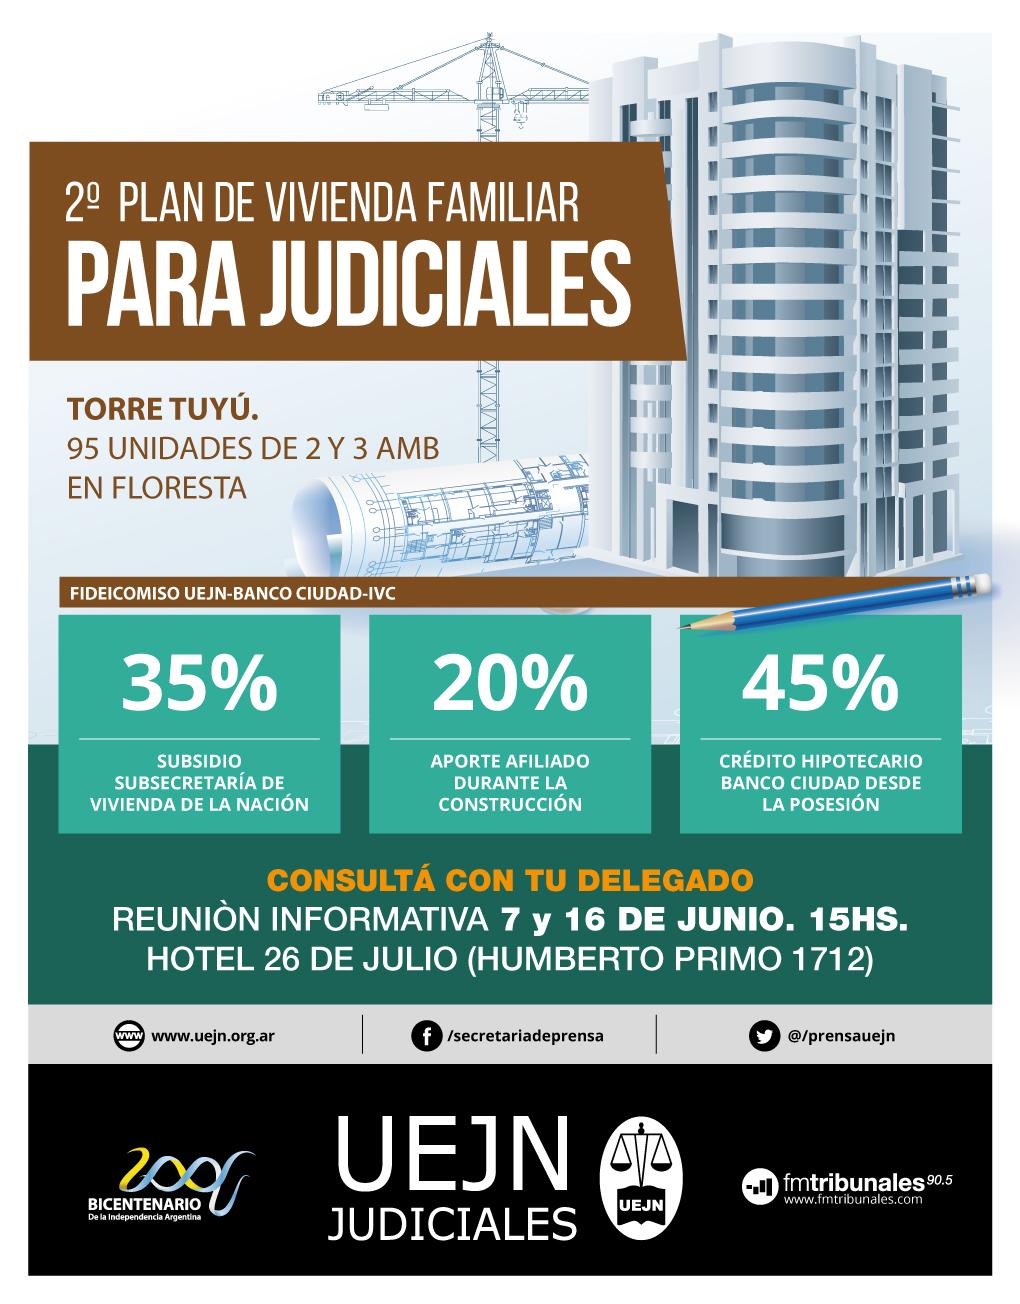 Nuevo plan de viviendas de bco nacion 2016 segundo plan de for Plan de viviendas macri